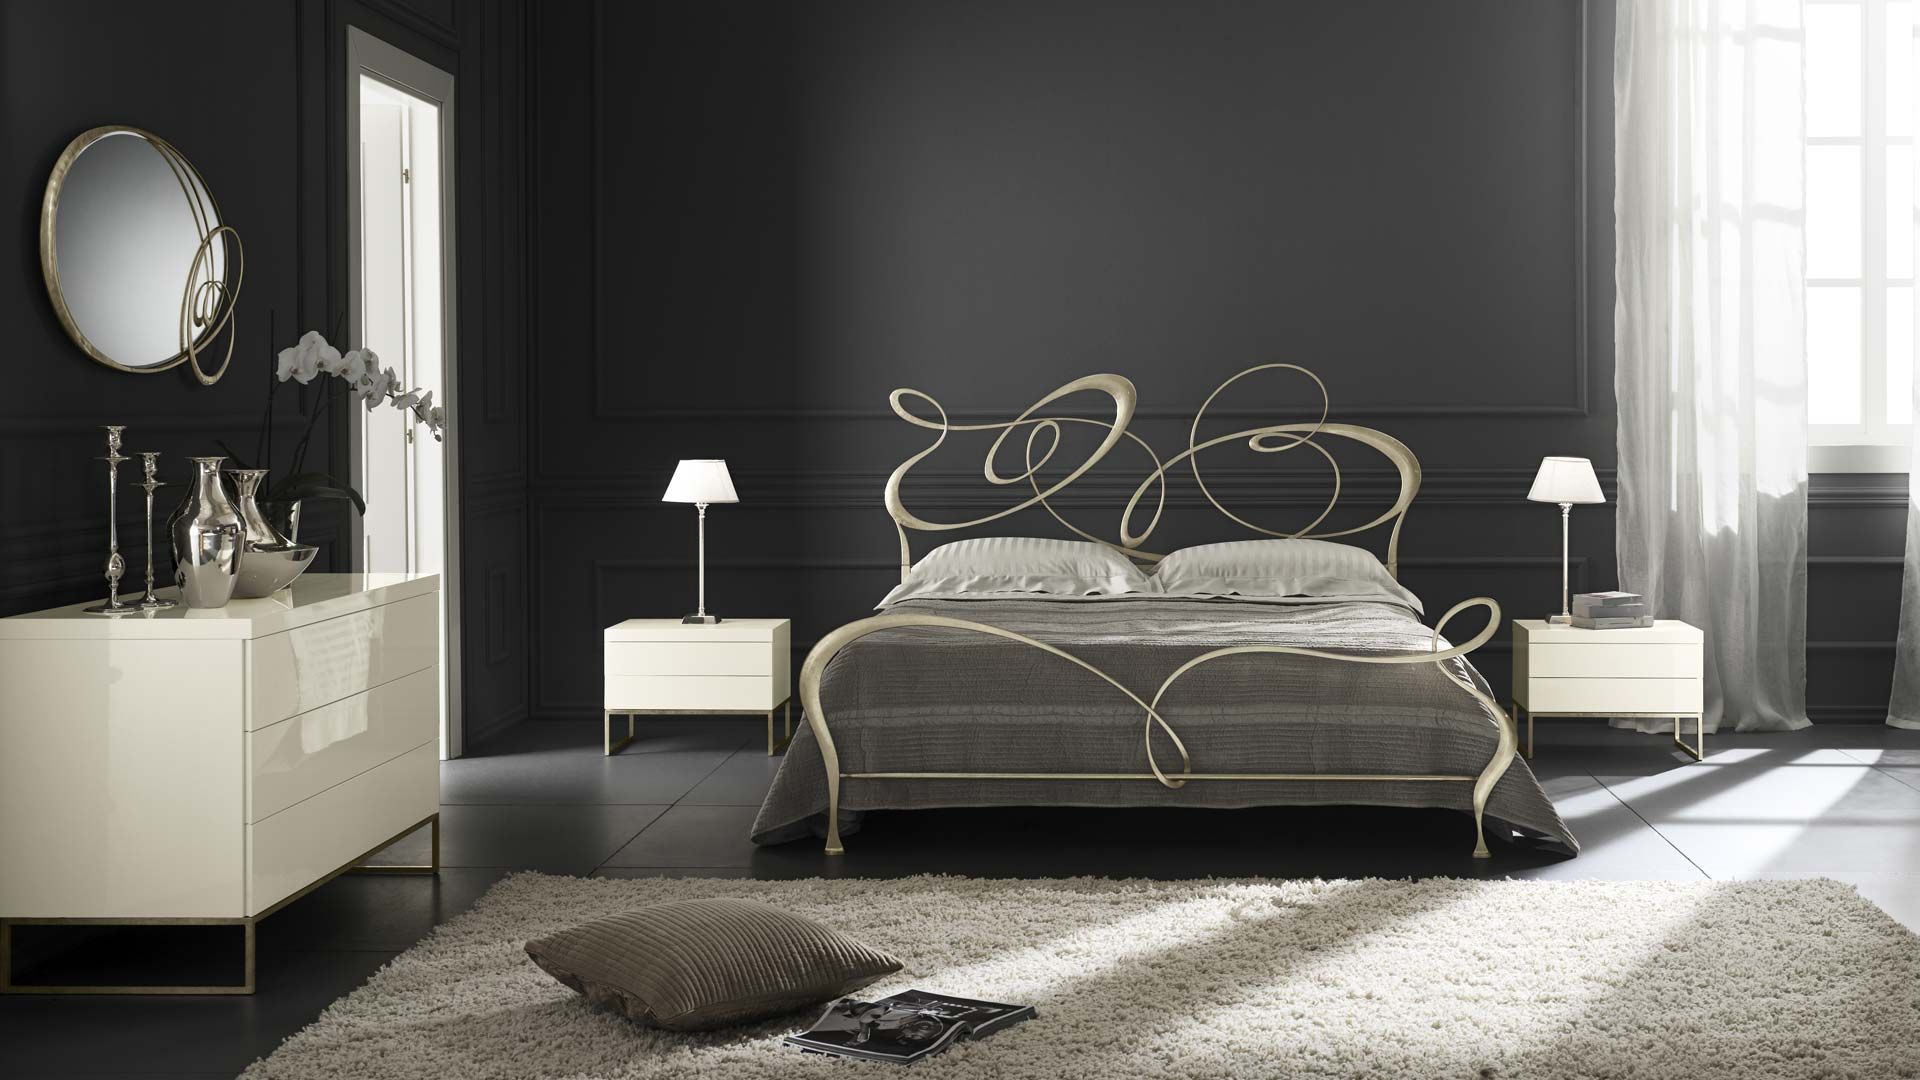 iron bed Ghirigori | For the Home nel 2018 | Pinterest | Camera da ...